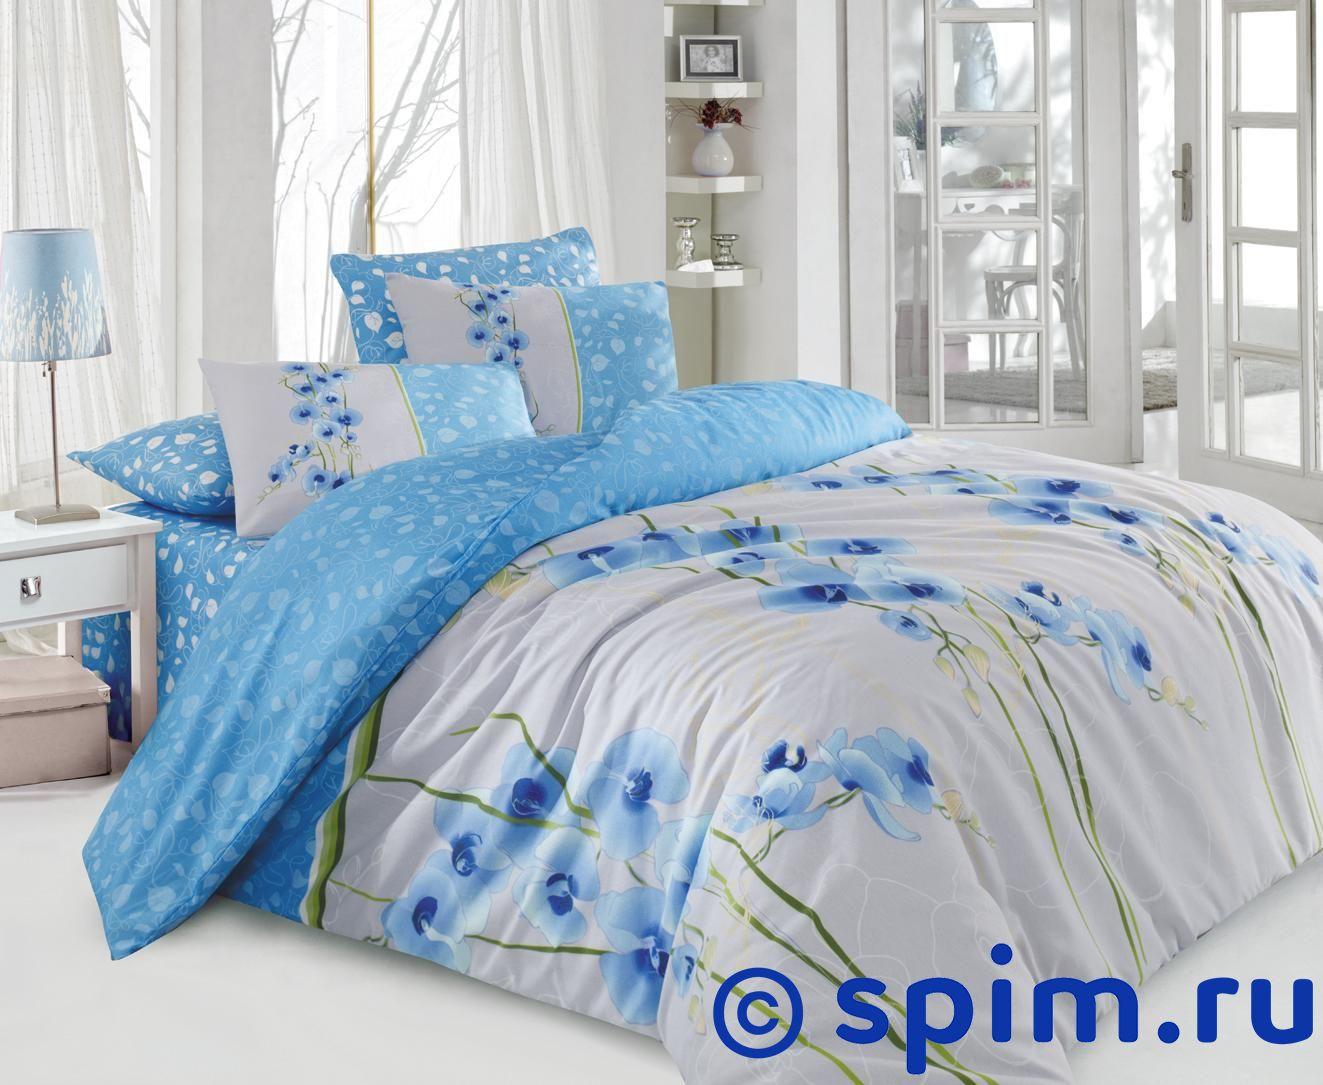 Постельное белье Cotton Life Orkide (50х70 см), голубой Евро-стандарт restline подушка cotton 50 70